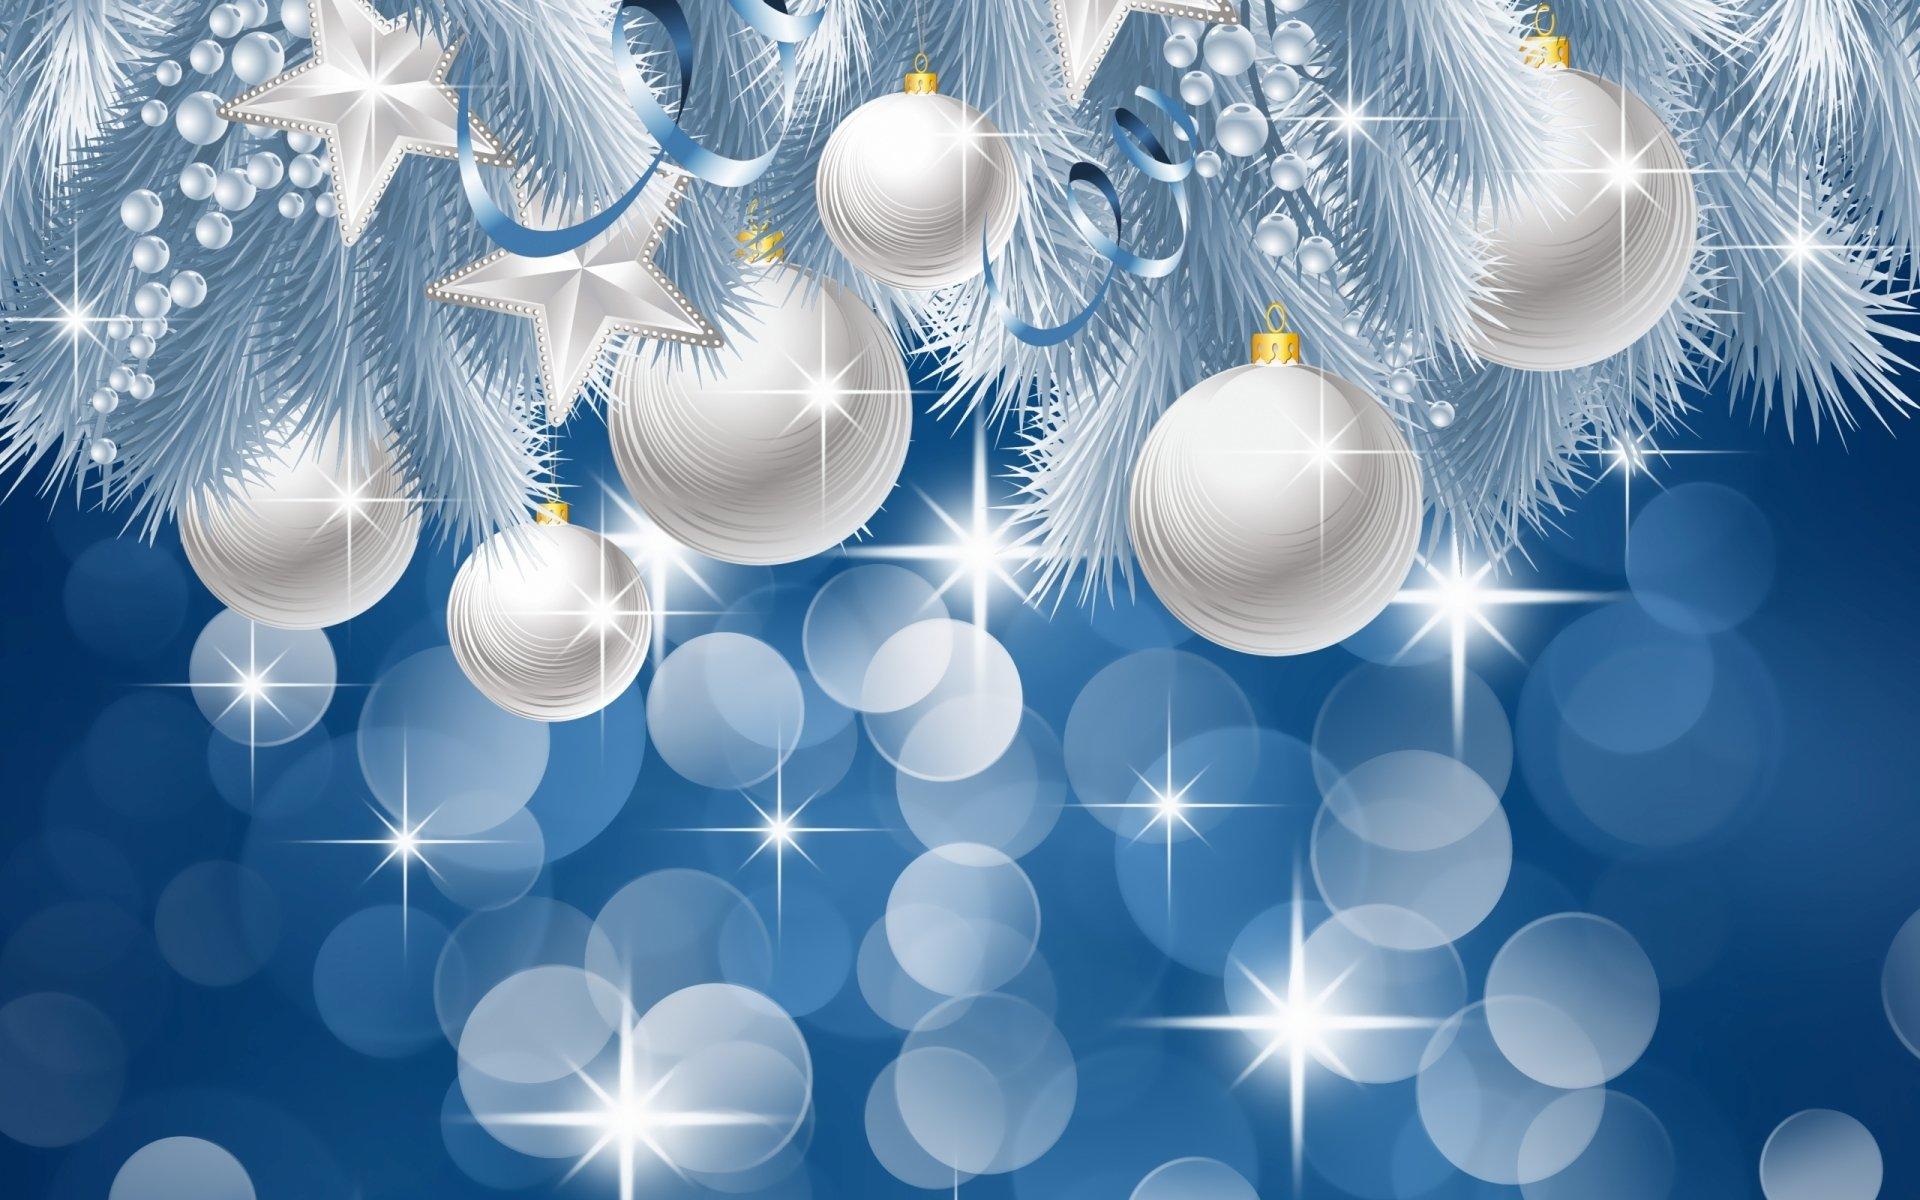 节日 - 圣诞节  Christmas Ornaments 壁纸